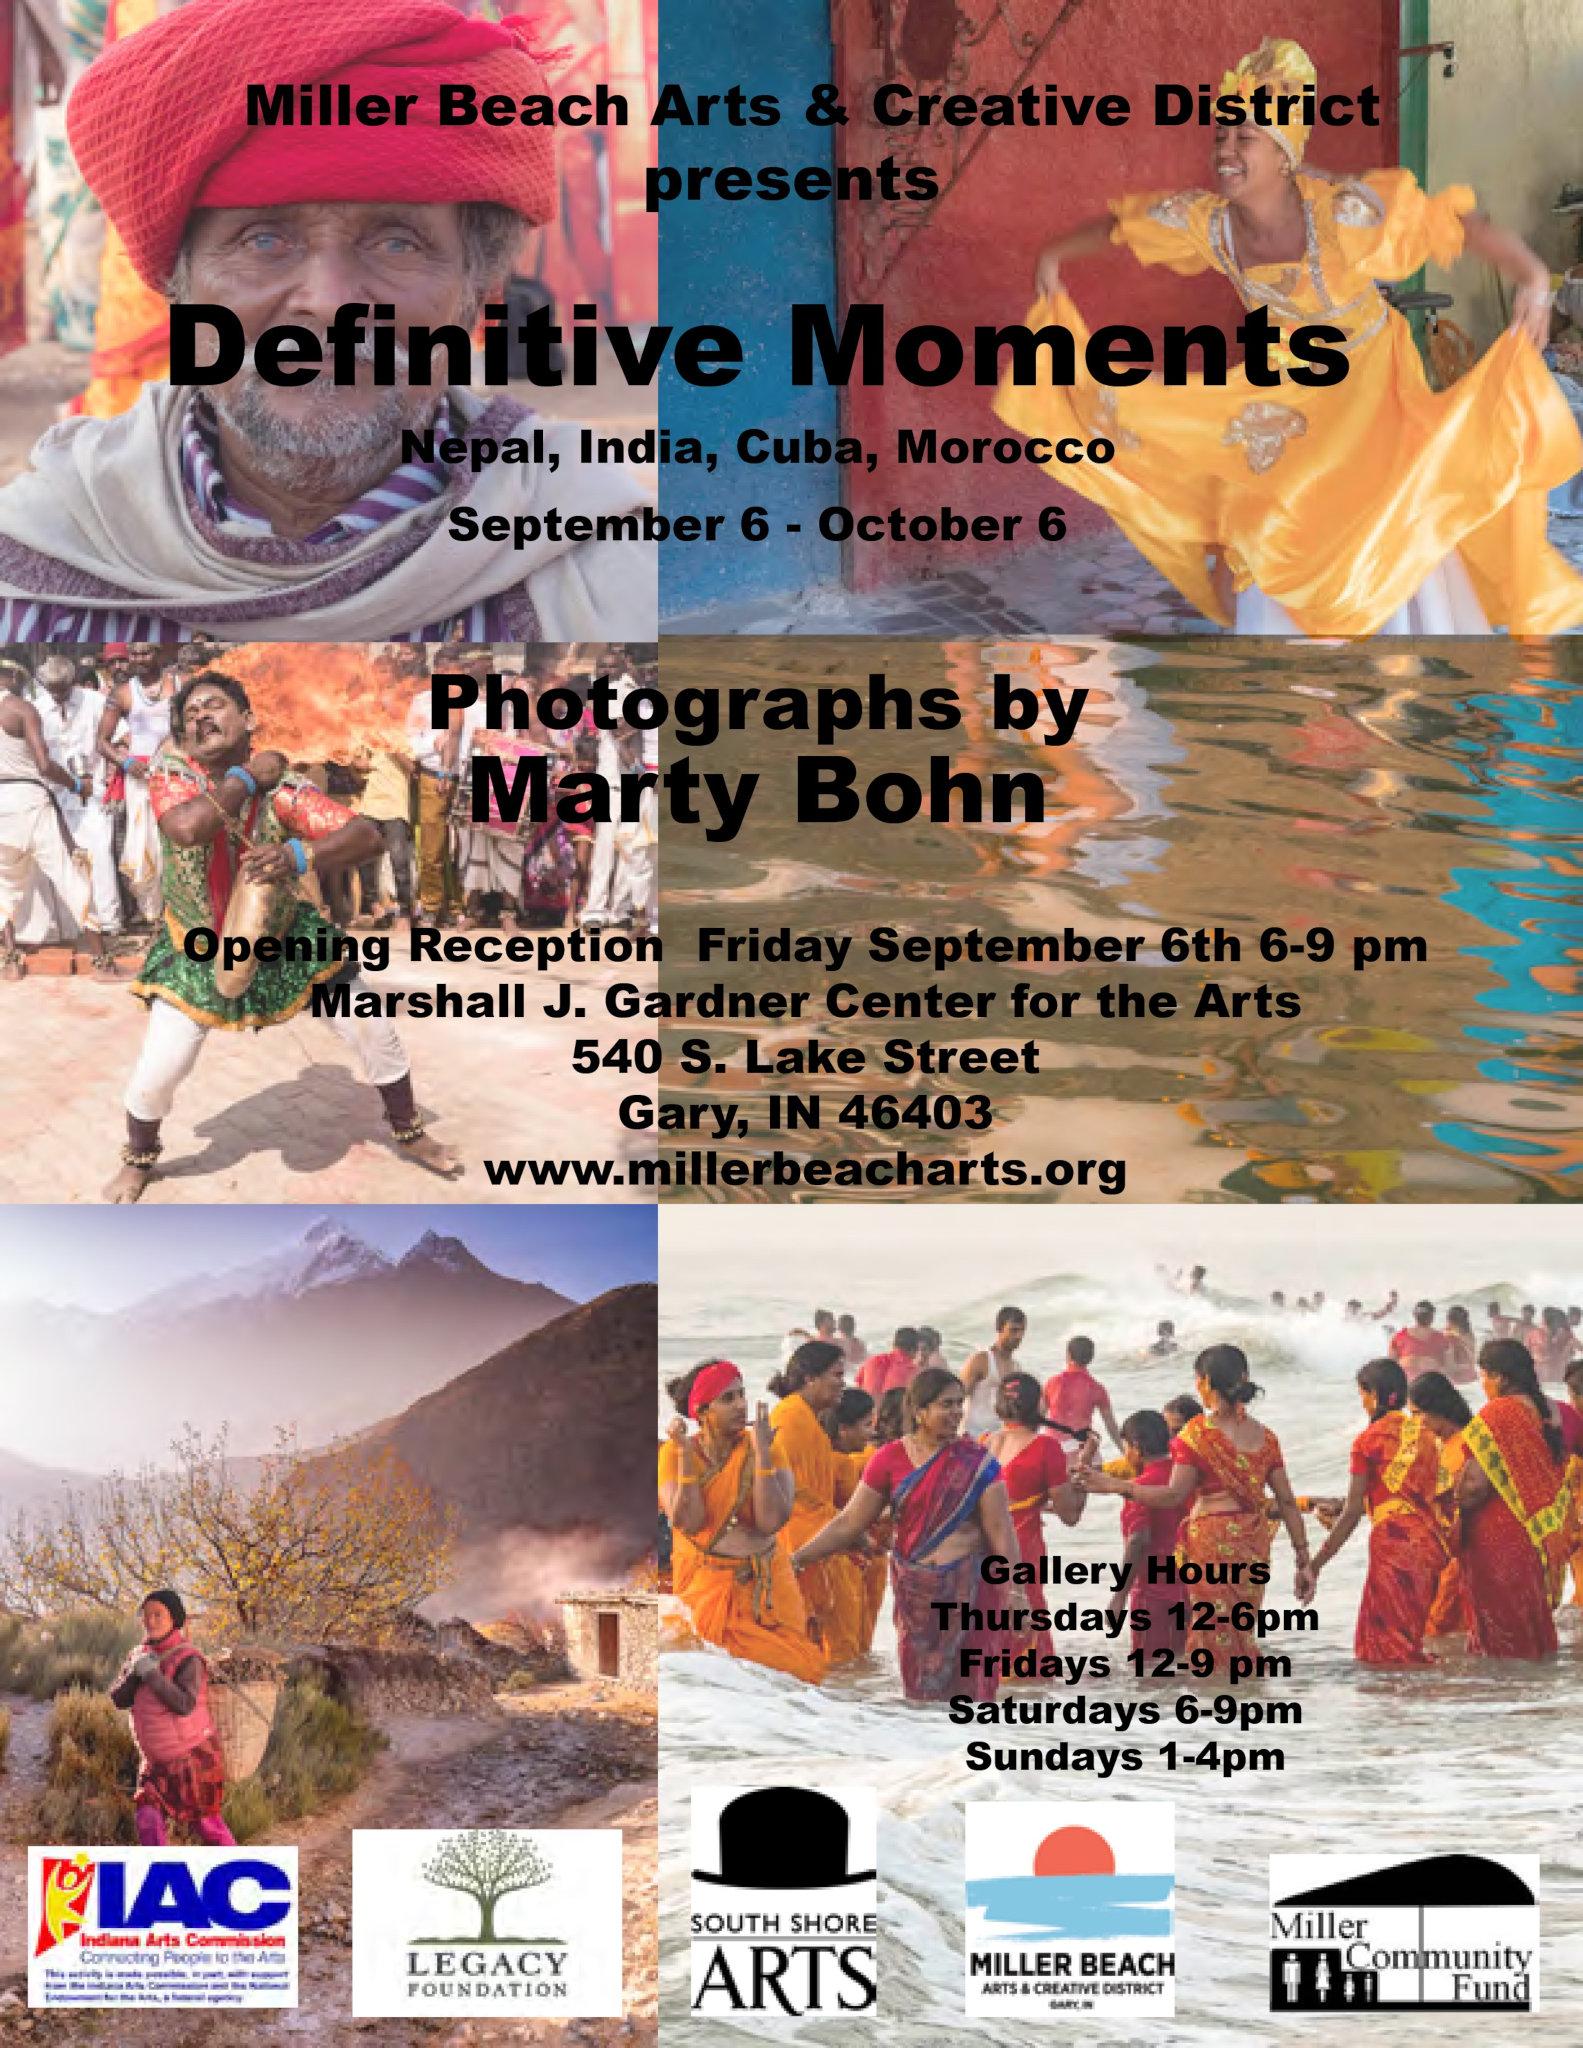 Flyer Marty Bohn Definitive Moments